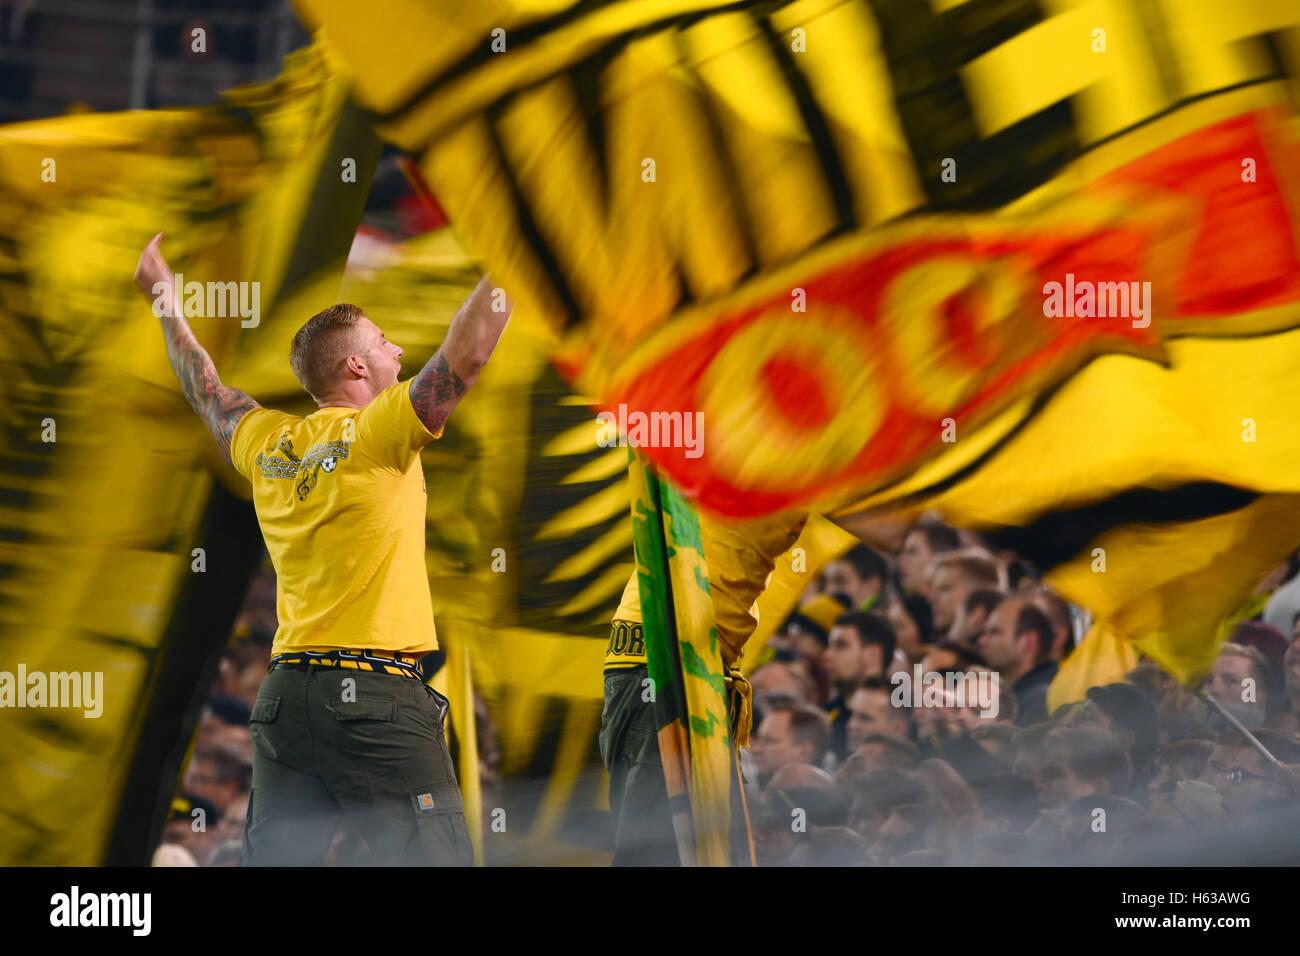 Manchester united vs liverpool tickets. Signal Iduna Arena Dortmund Germany 14 10 2016 1 Football Stock